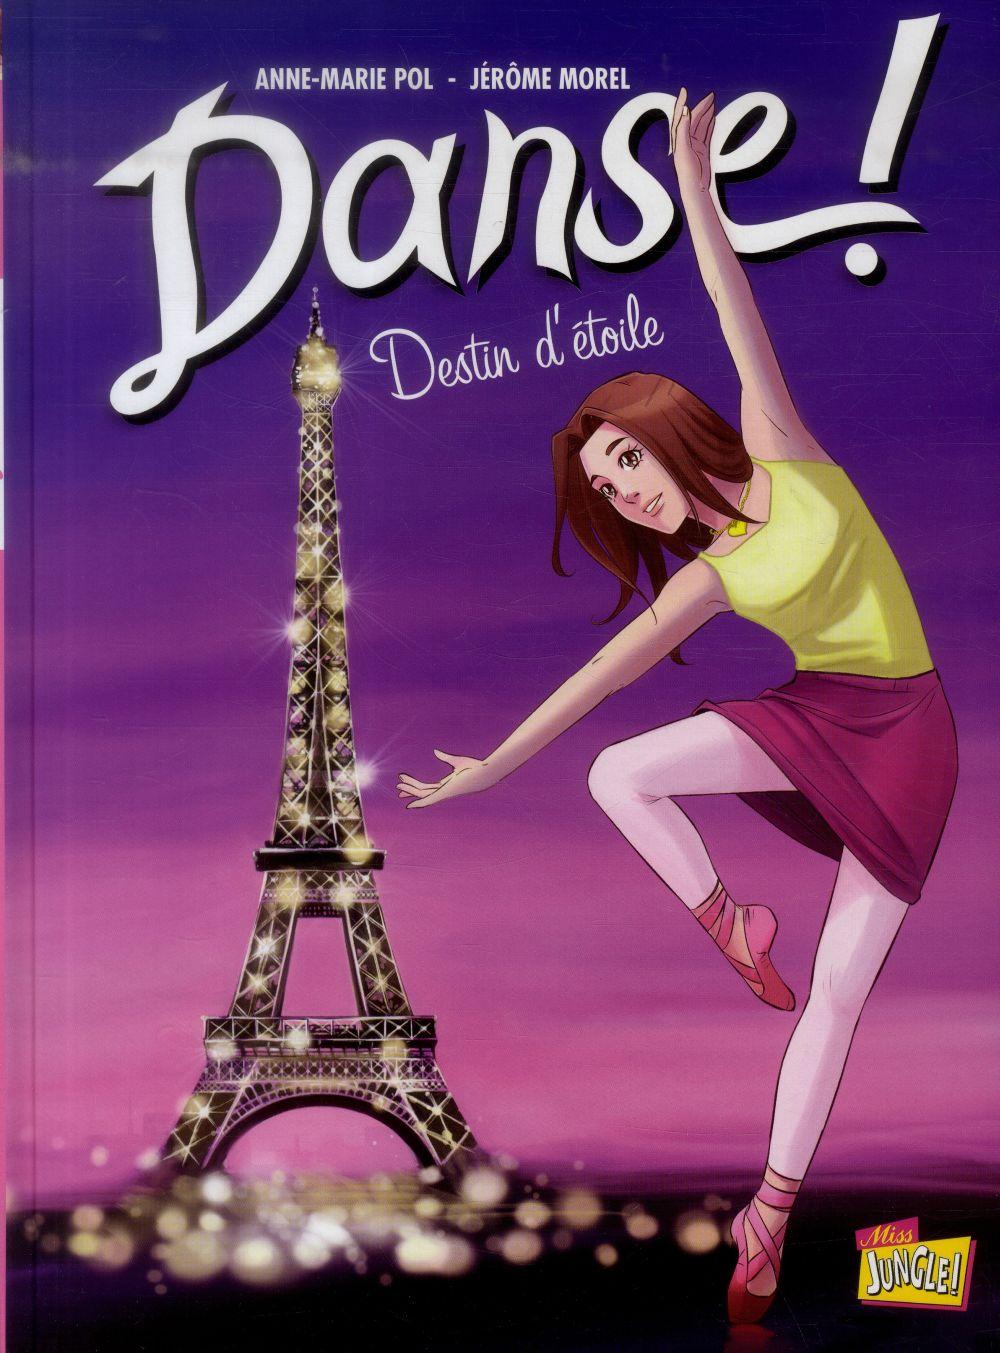 DANSE T5 - DESTIN D'ETOILE